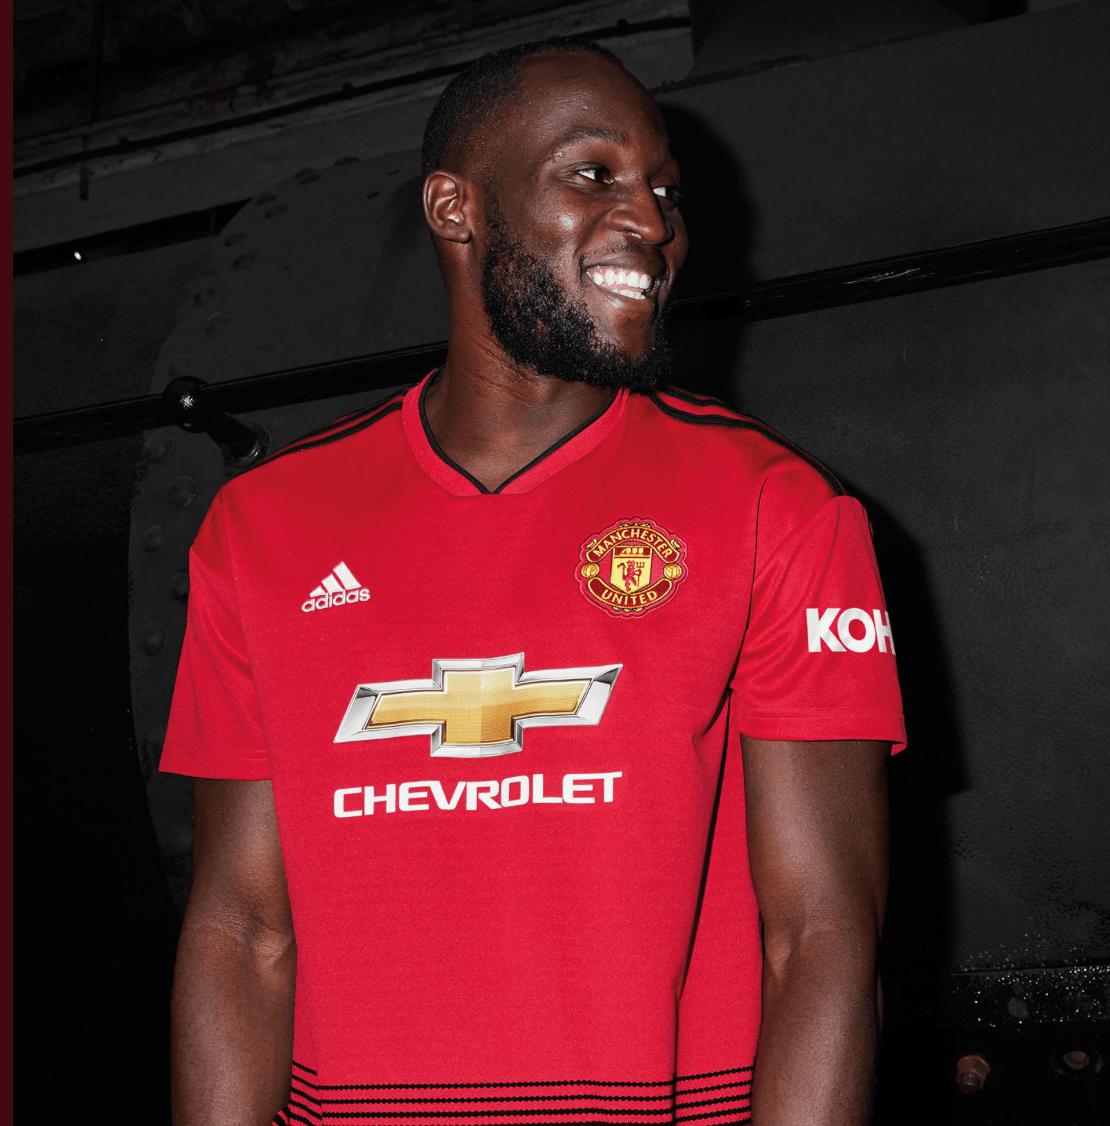 ¡Elegante! Manchester United presentó su nuevo uniforme